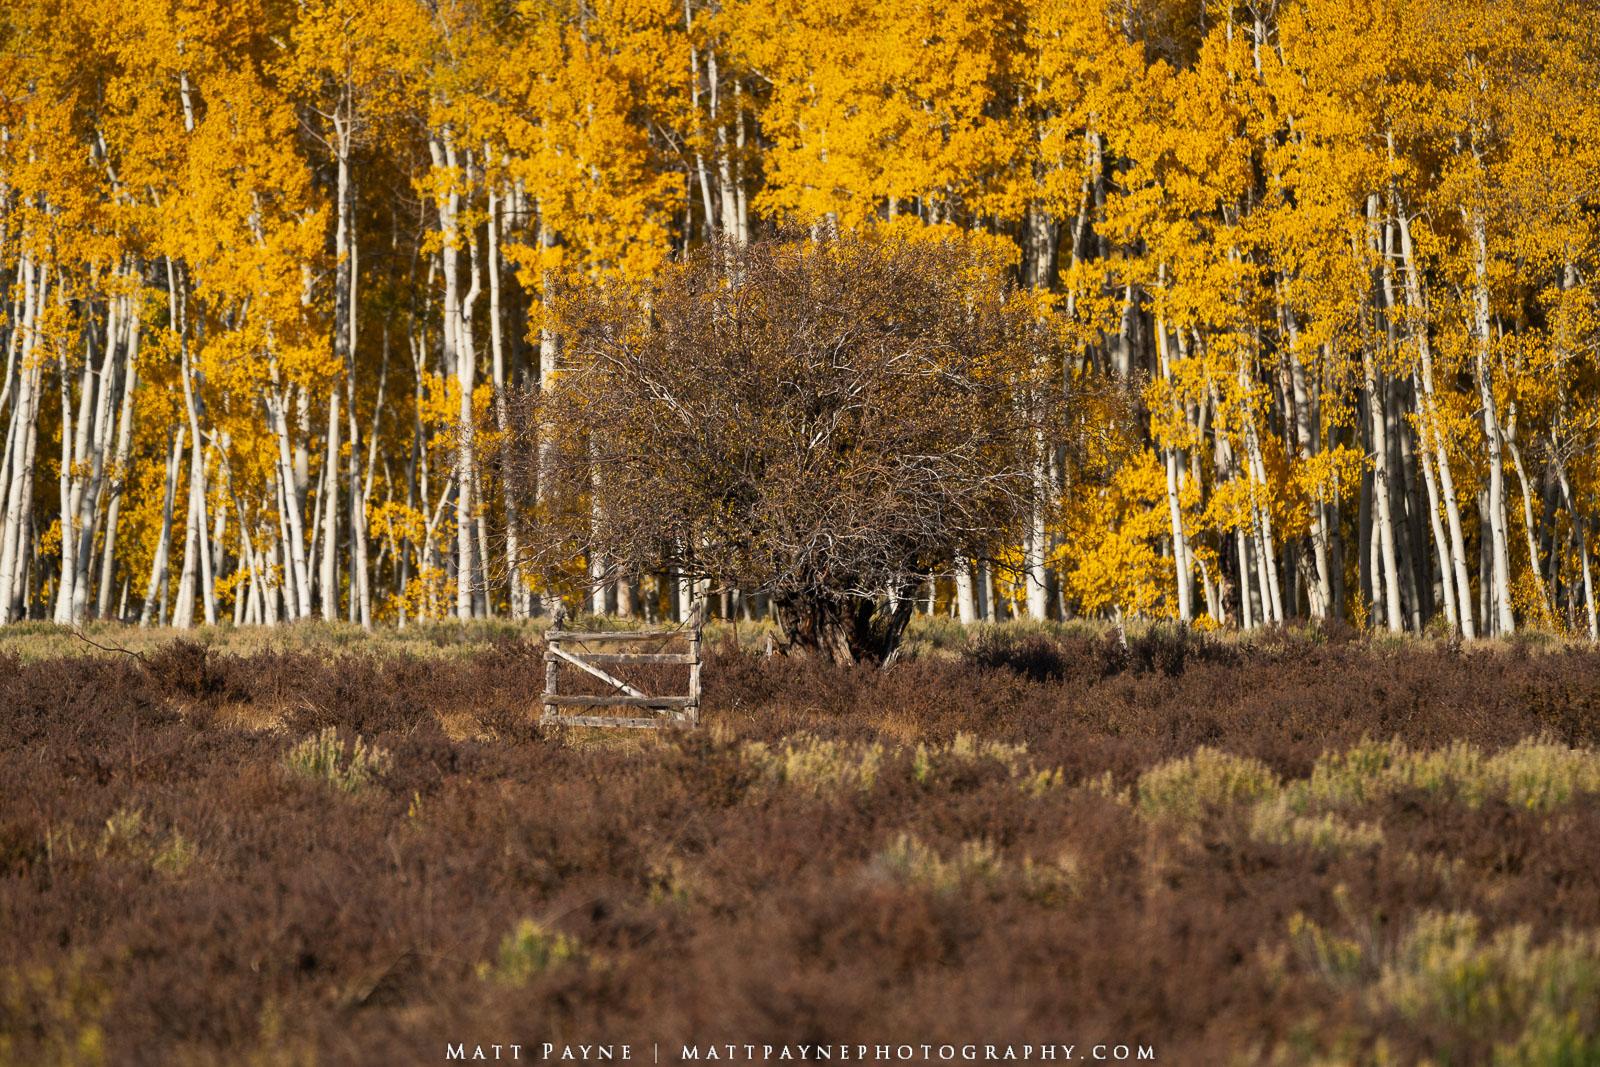 Aspen Trees, Autumn, Colorado, Fall, Fall Colors, San Juan Mountains, gate, willow tree, Landscape Photography, photo